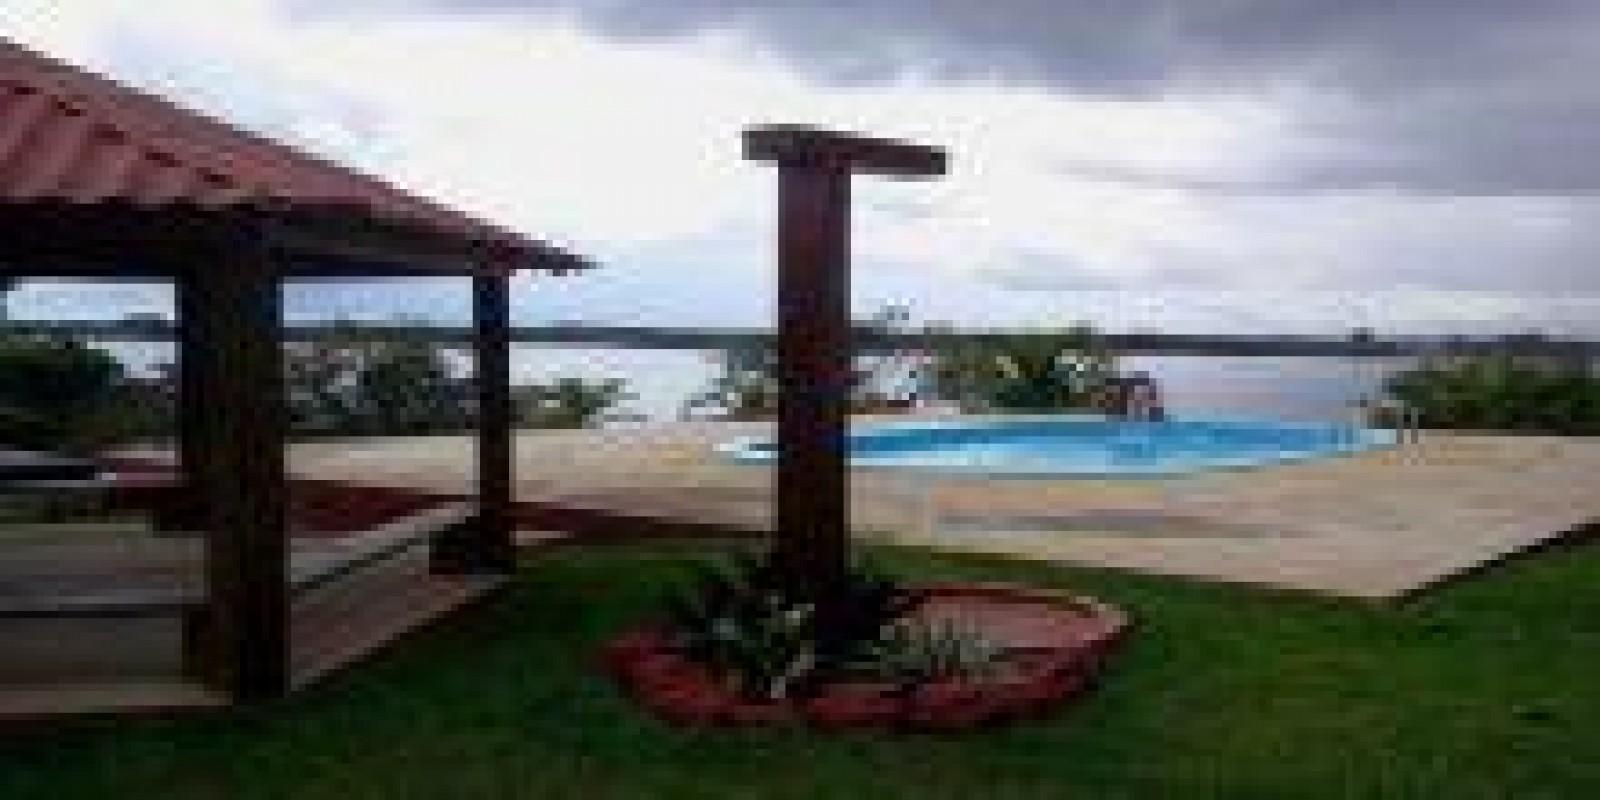 Pousada Mamori - Manaus - Foto 8 de 11